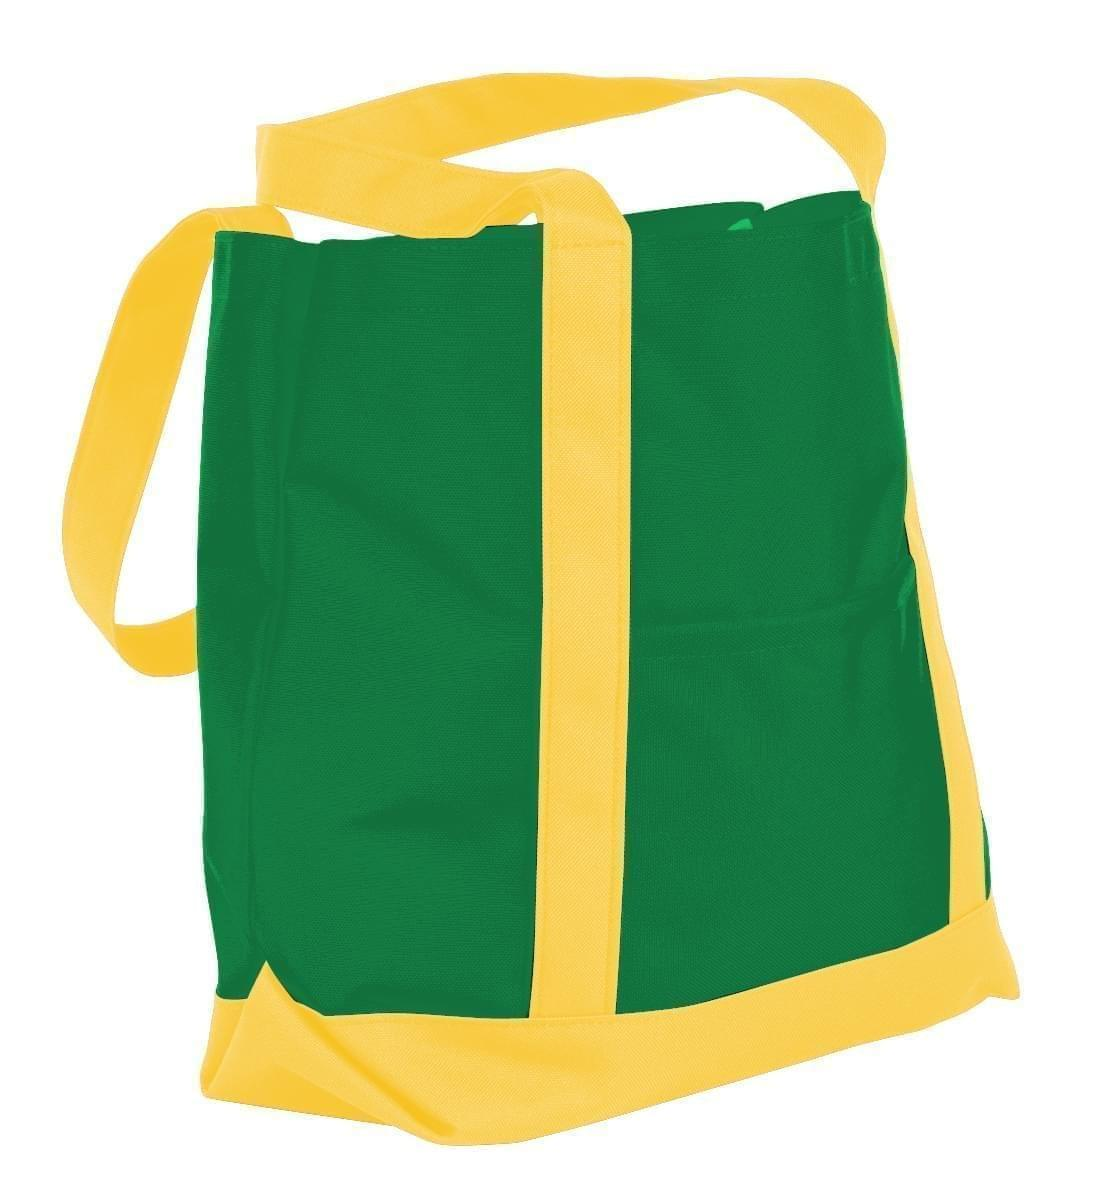 USA Made Nylon Poly Boat Tote Bags, Kelly Green-Gold, XAACL1UATQ